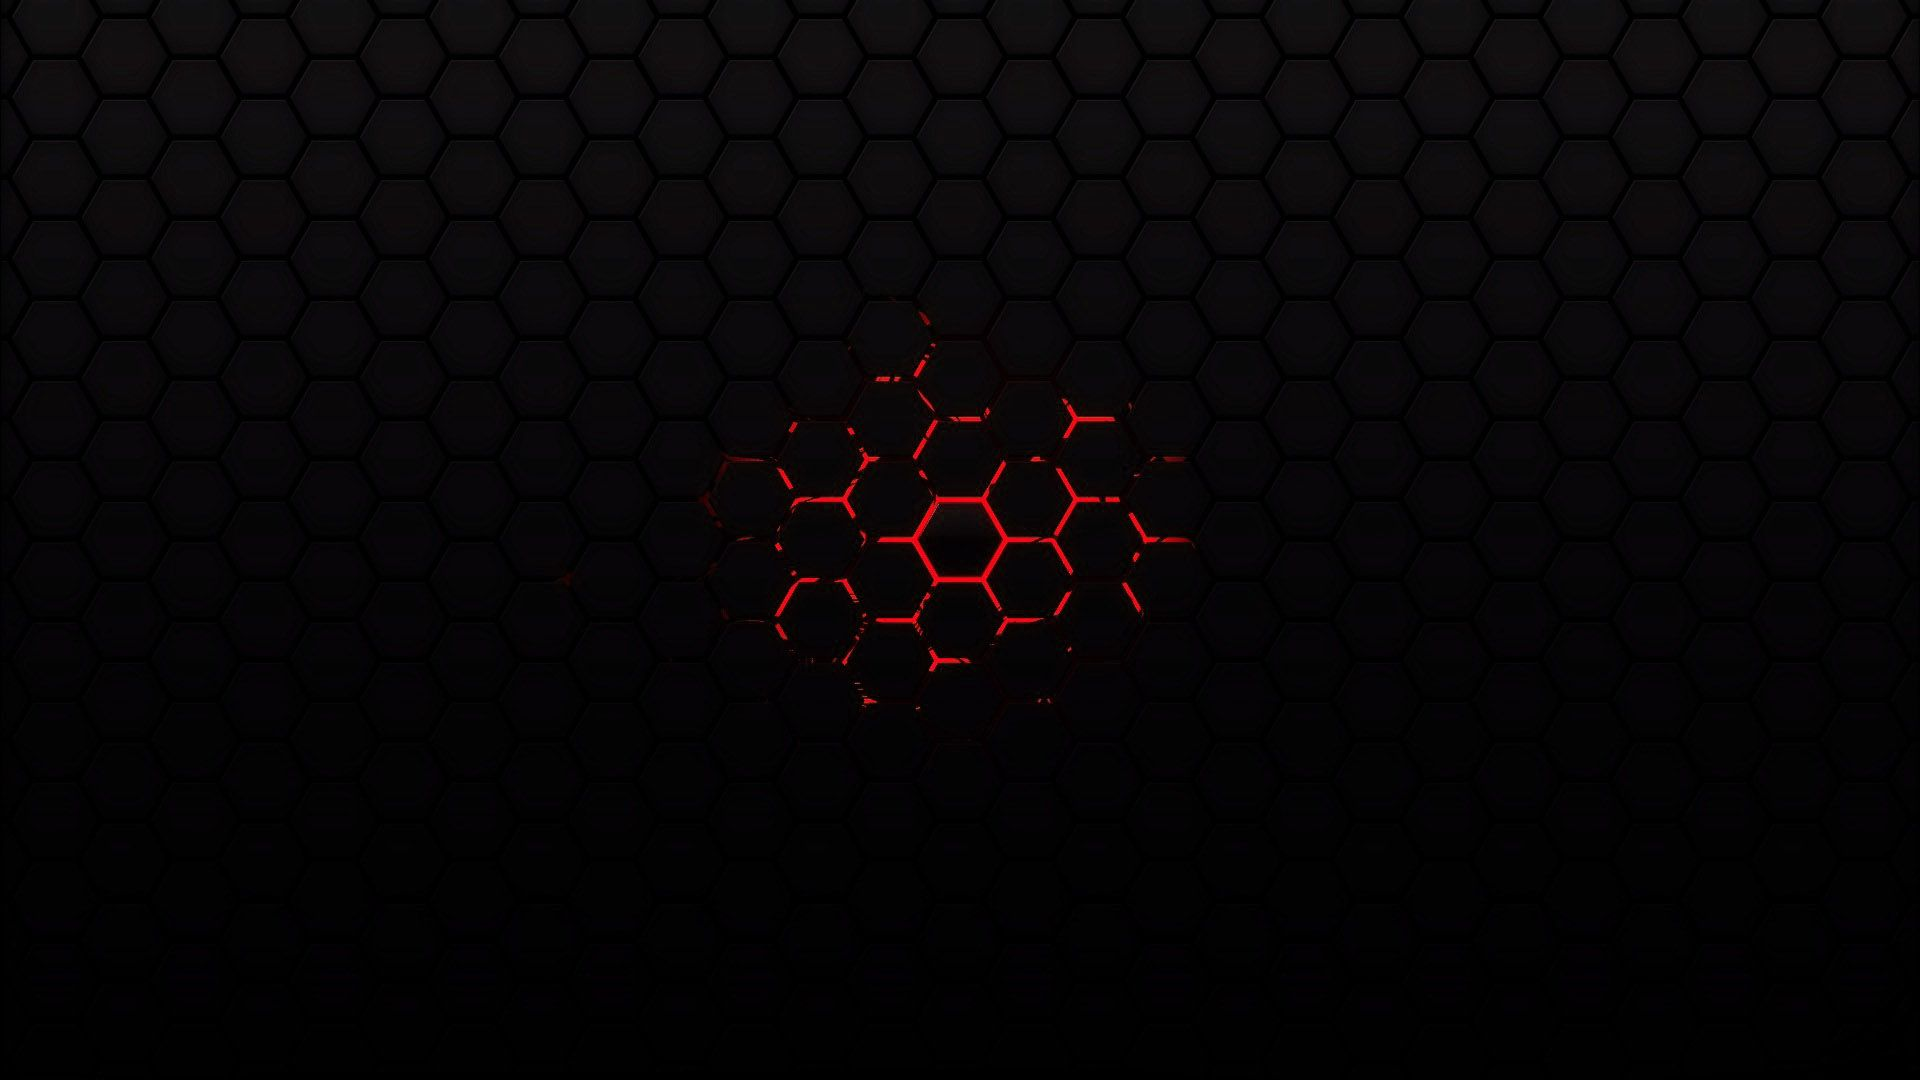 black background leather hd desktop wallpaper widescreen high hd